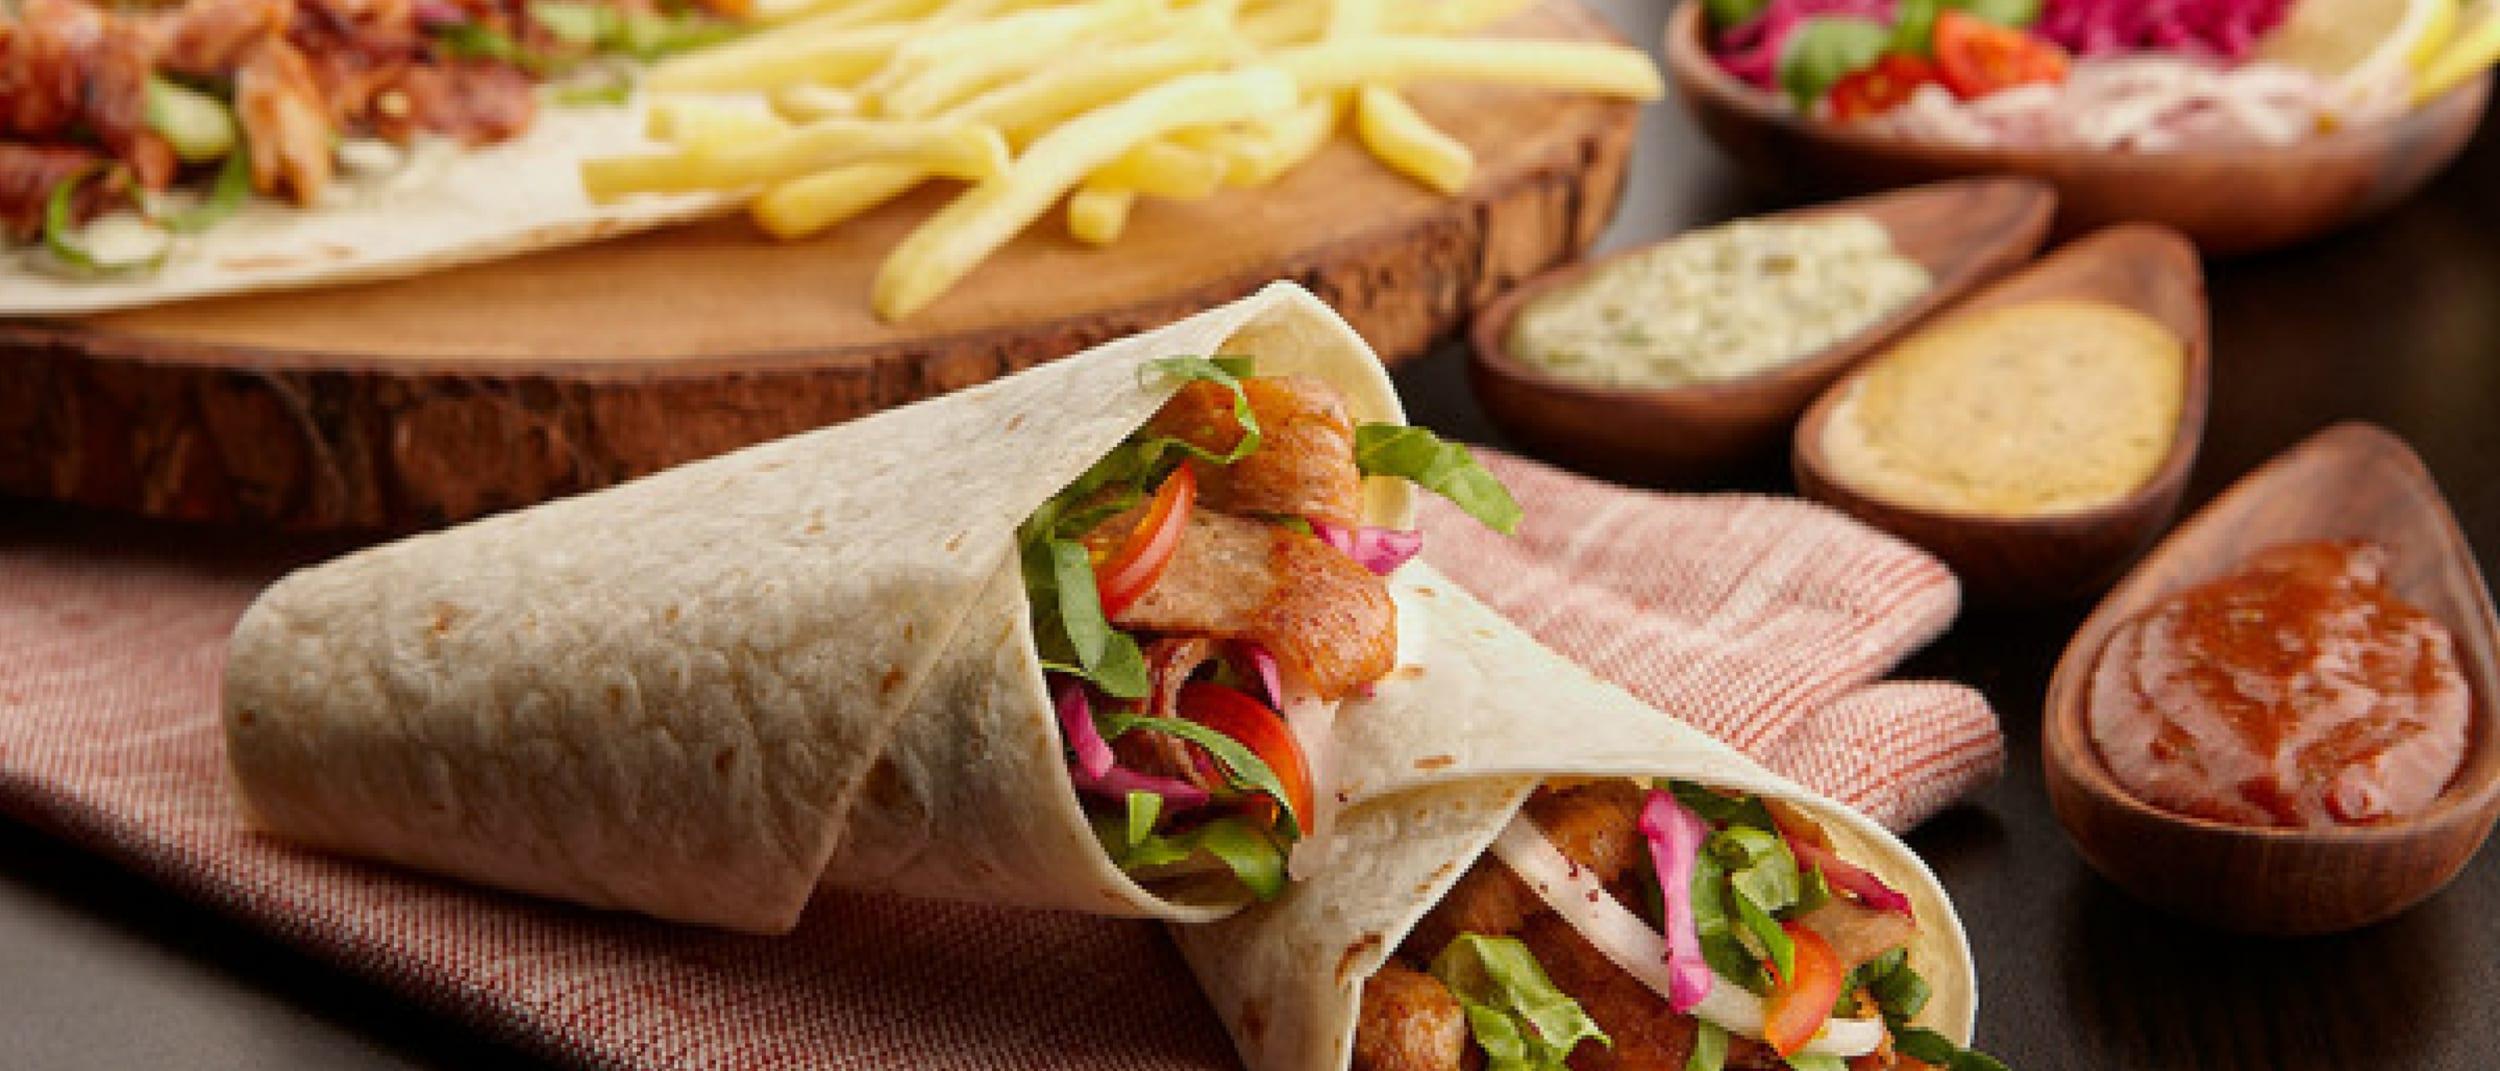 Sultanbey Kebab student offer